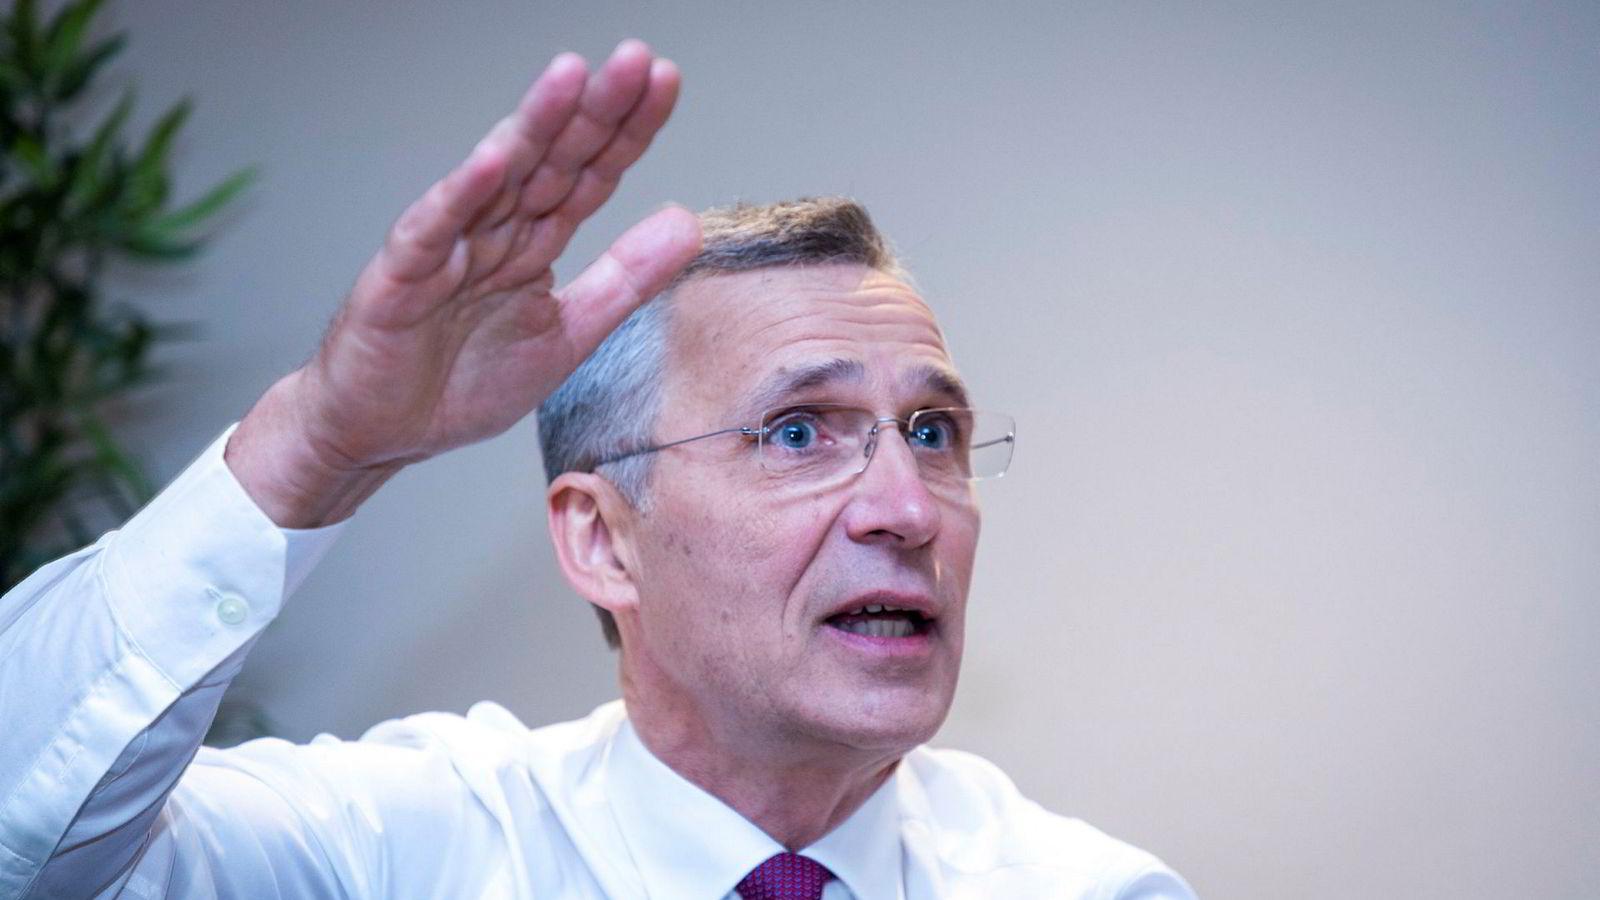 Nato-sjef er fornøyd med mange Nato-lands finansielle bidrag. Norge er ikke blant dem.